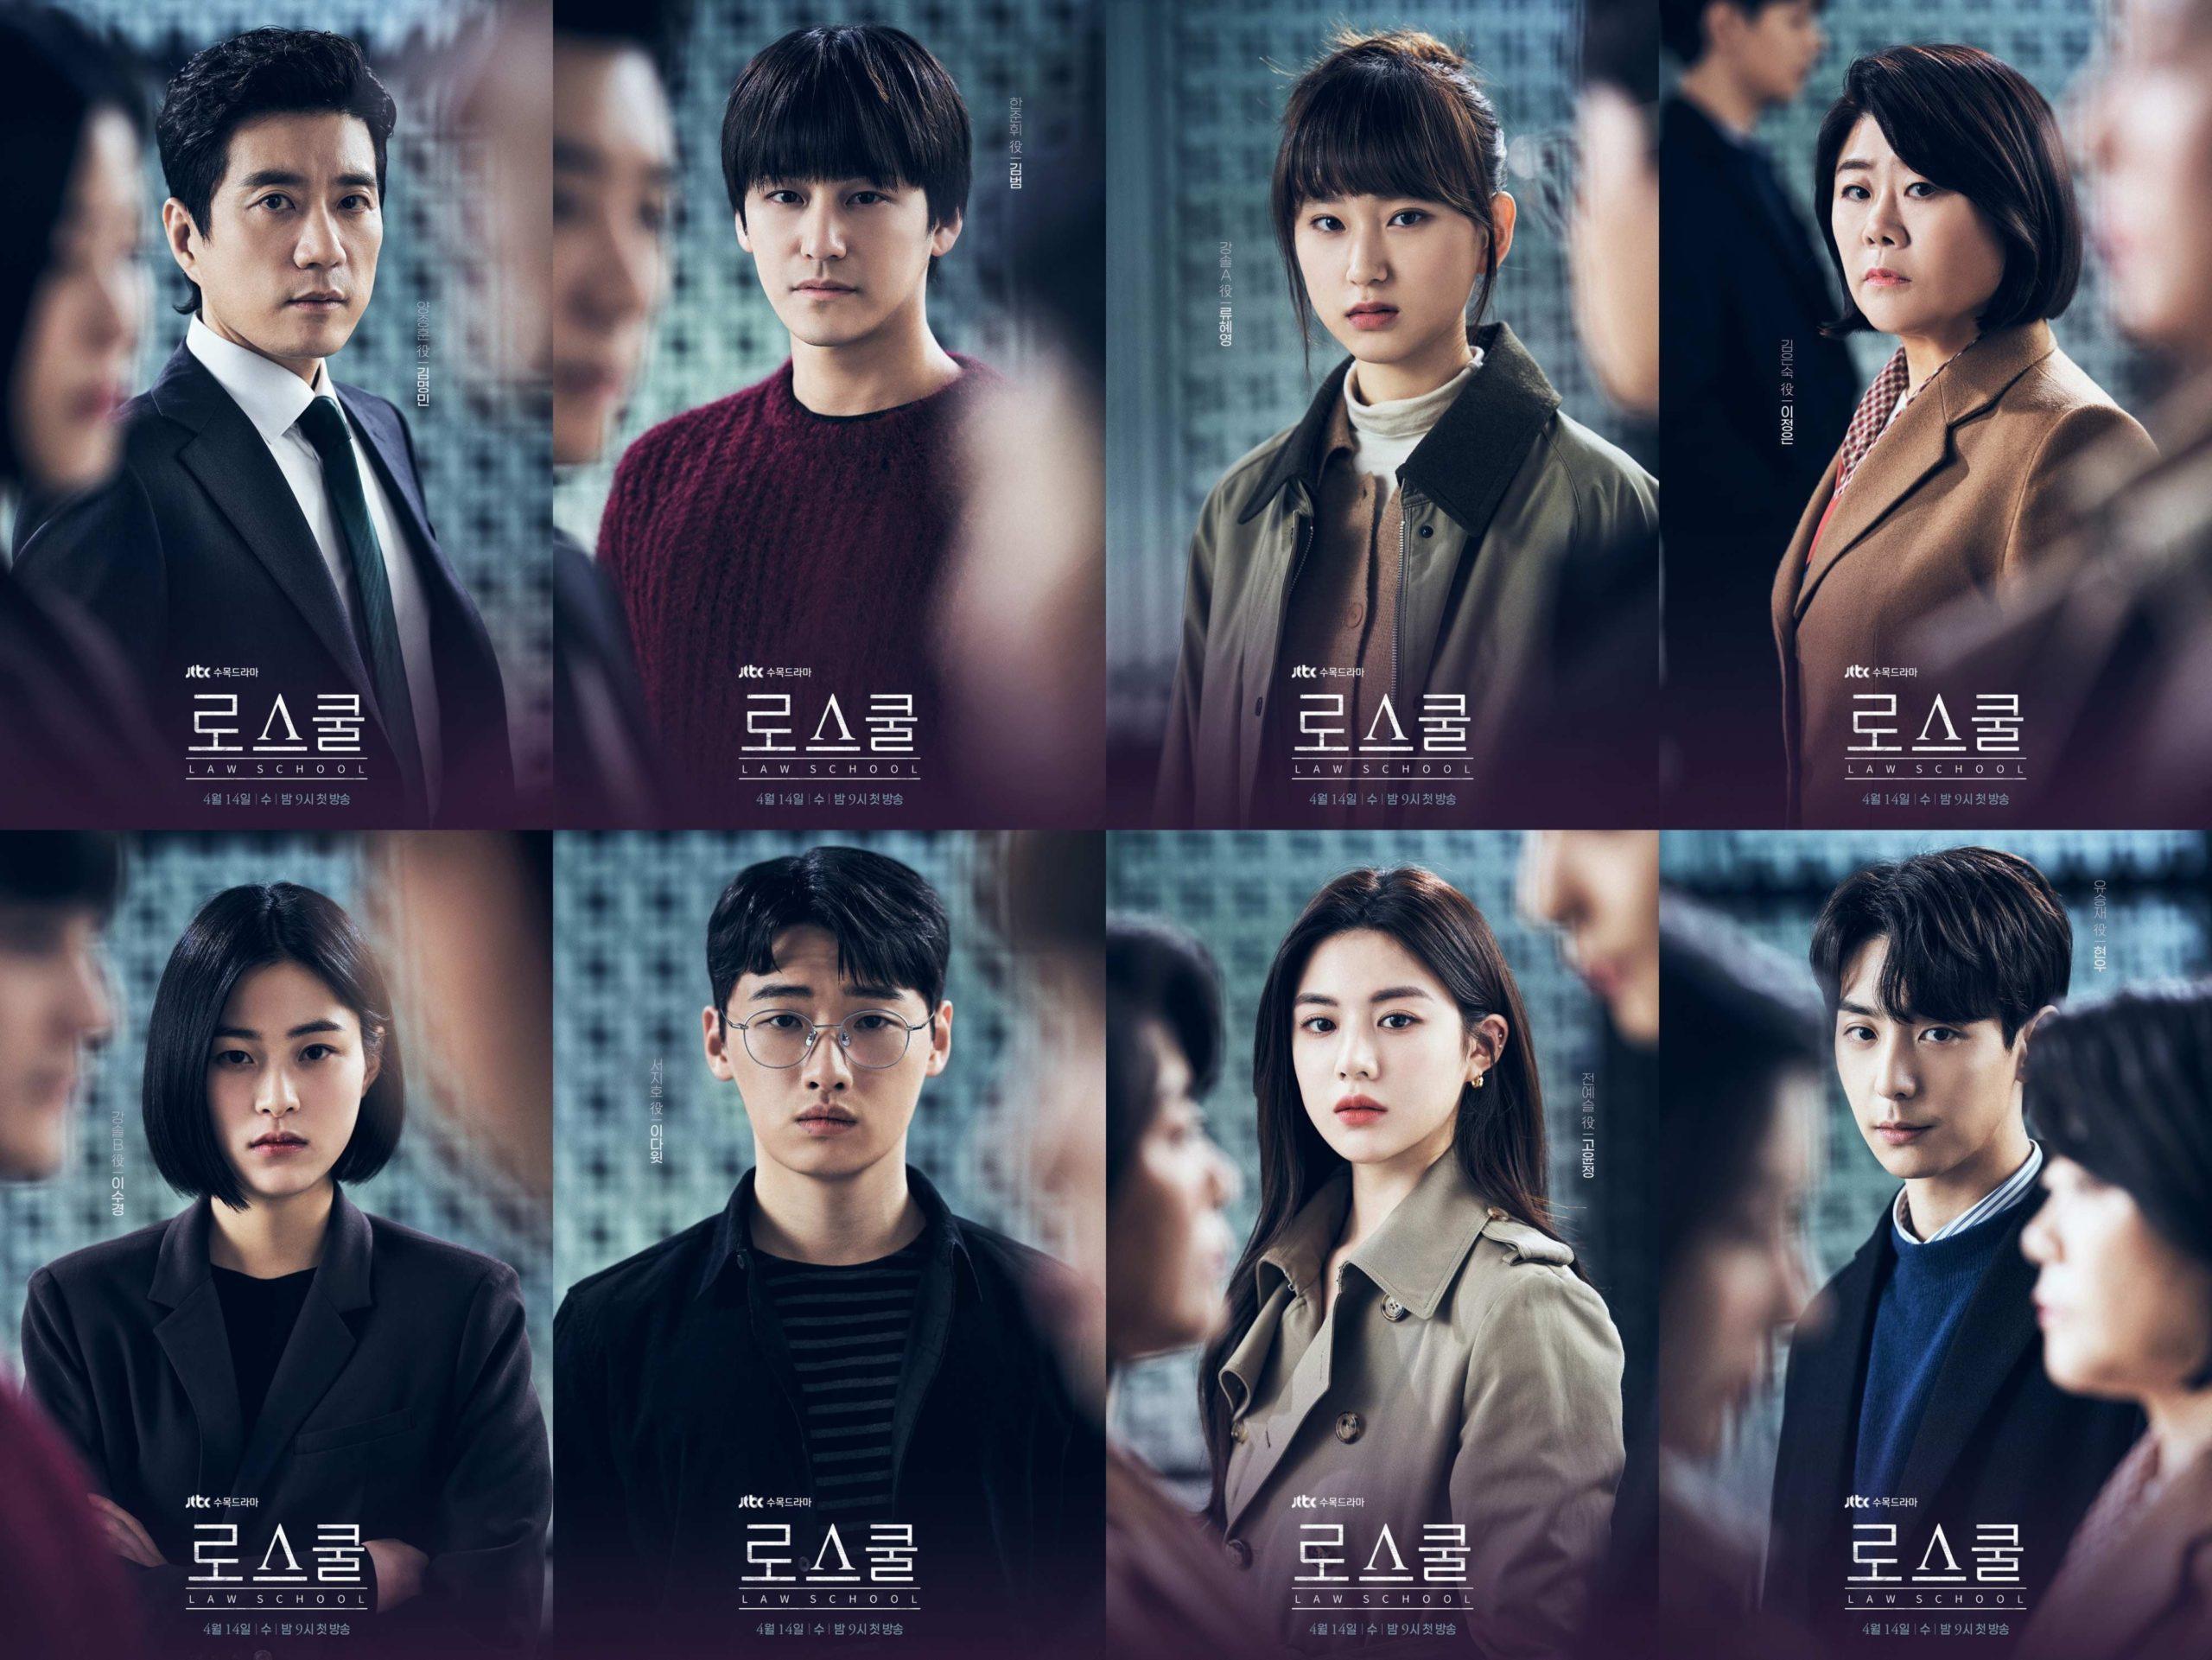 Poster drama Korea Law School.